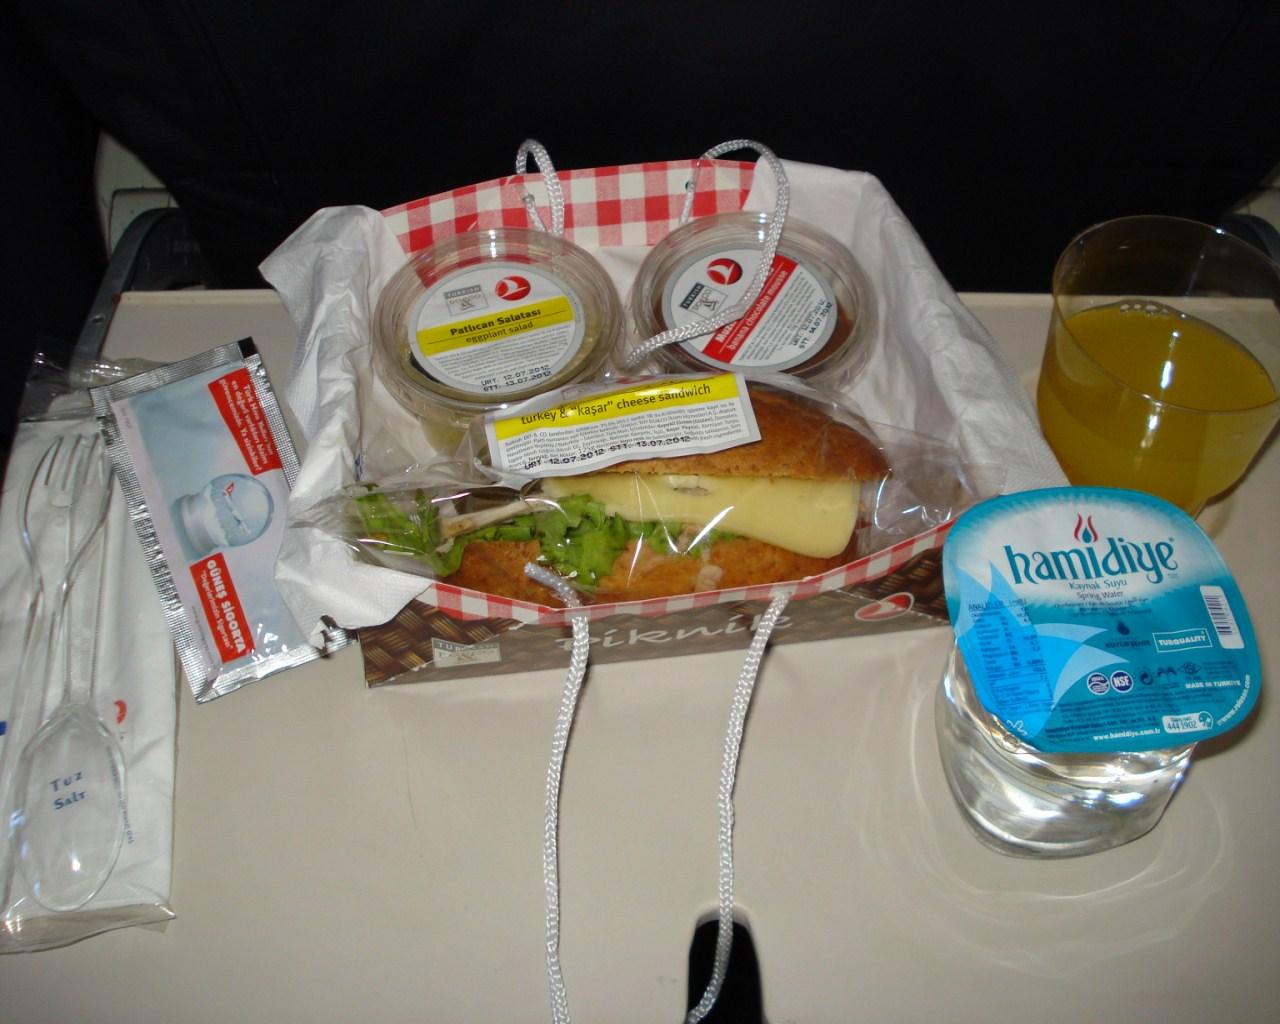 Питание на рейсе Стамбул-Адана Турецких авиалиний